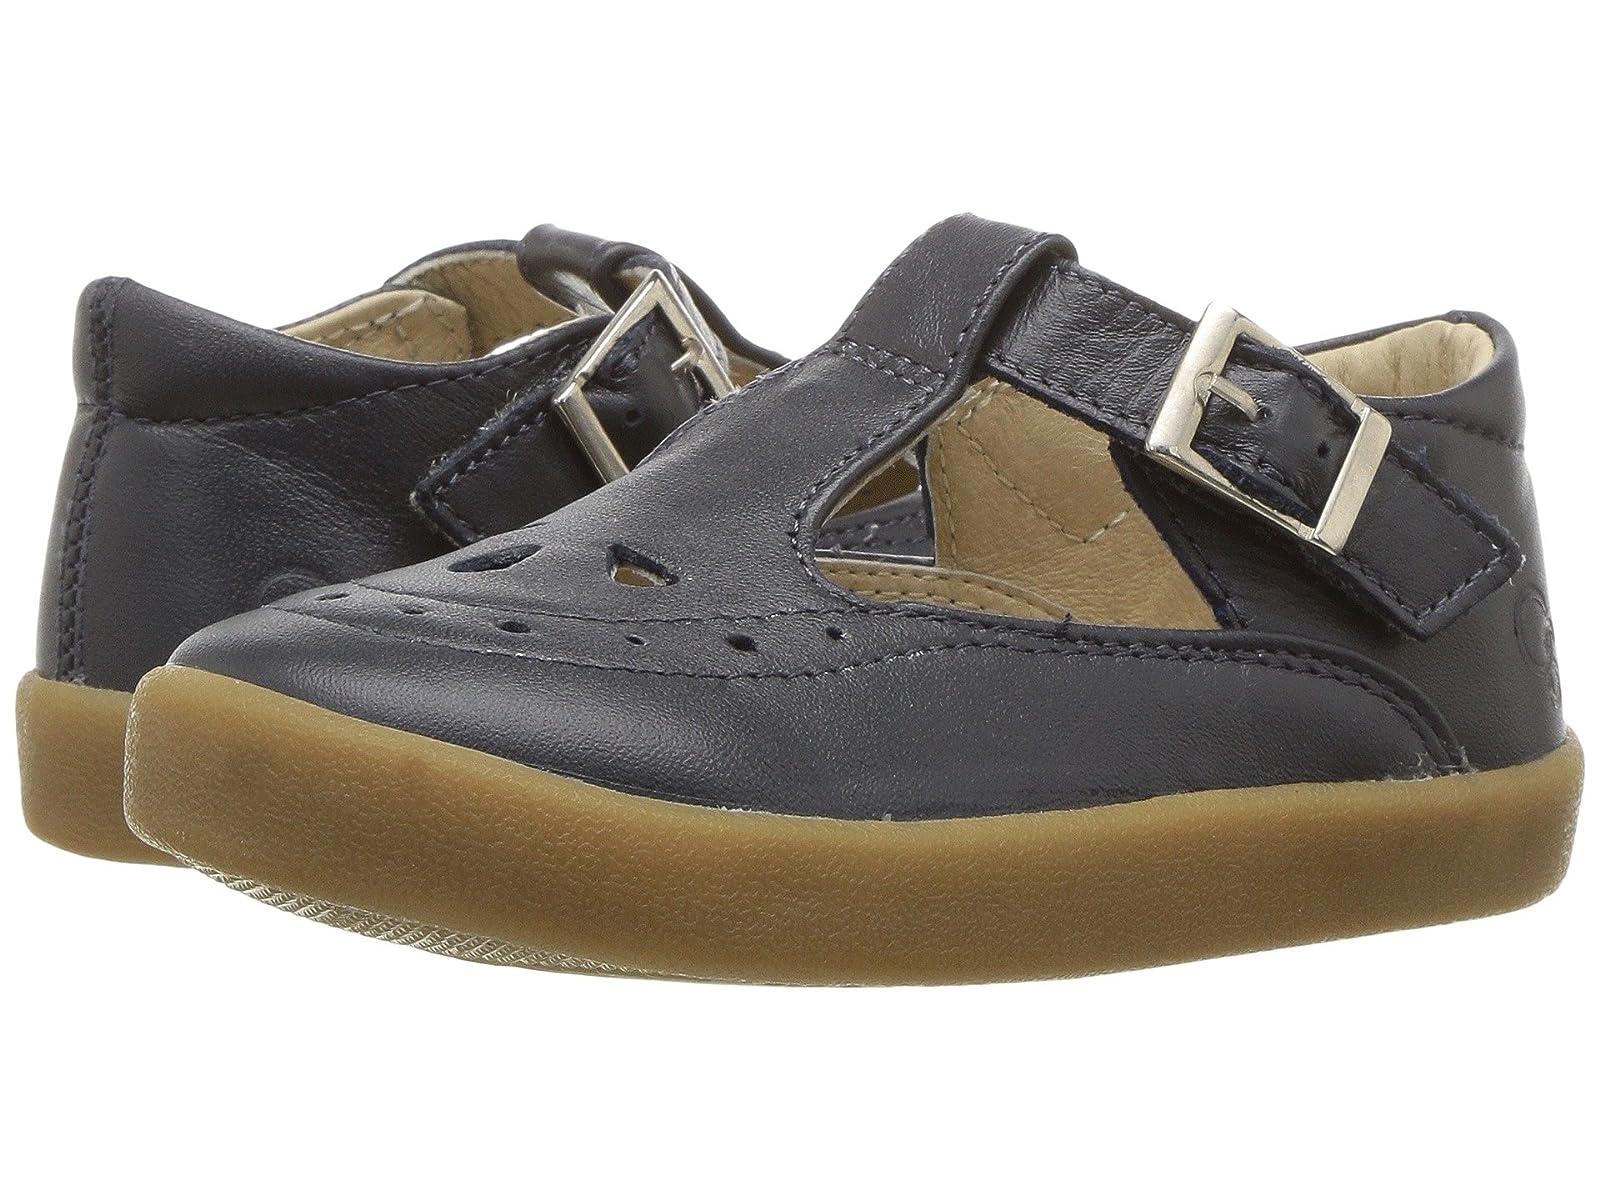 Old Soles Royal Shoe (Toddler/Little Kid)Atmospheric grades have affordable shoes